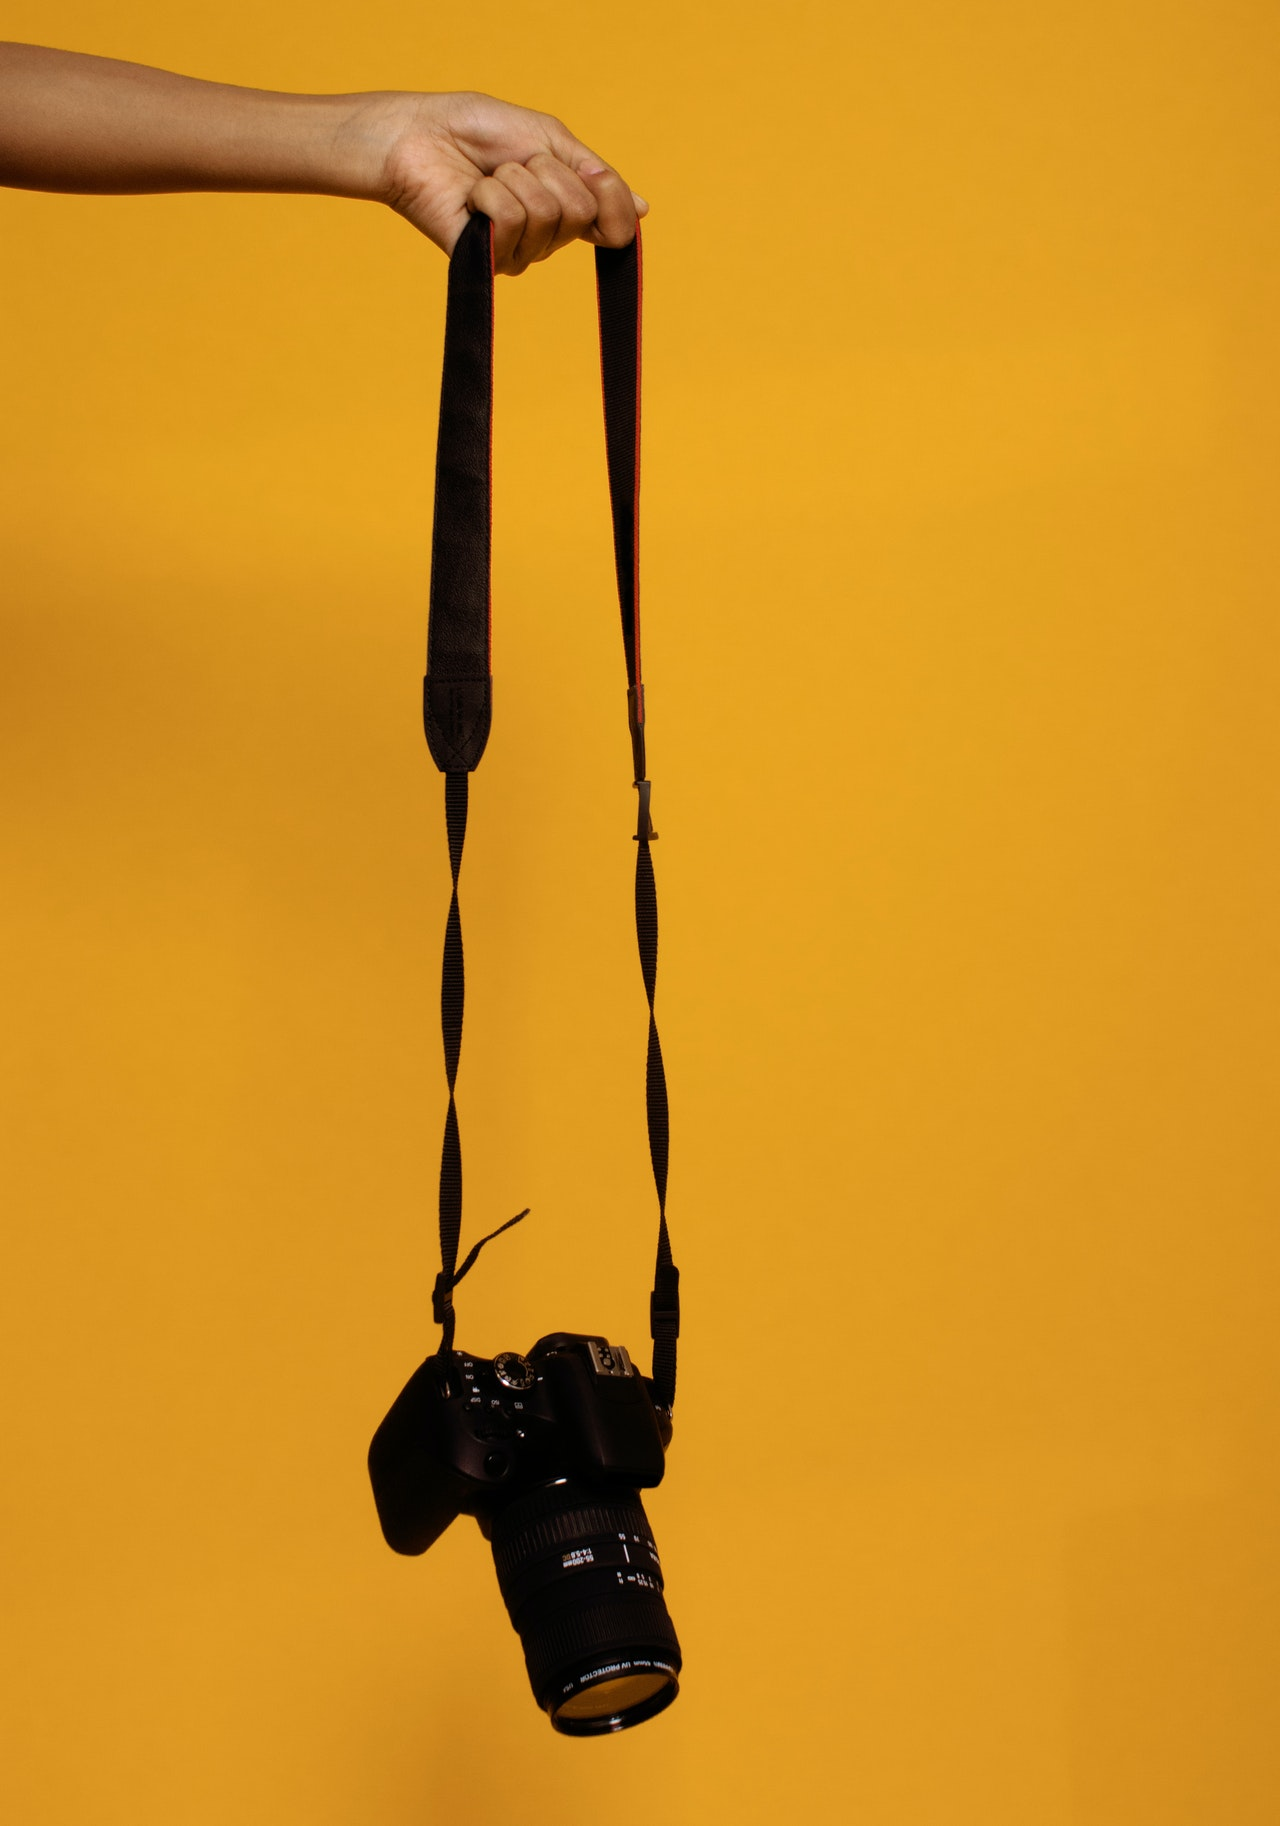 photo of person holding black dslr camera